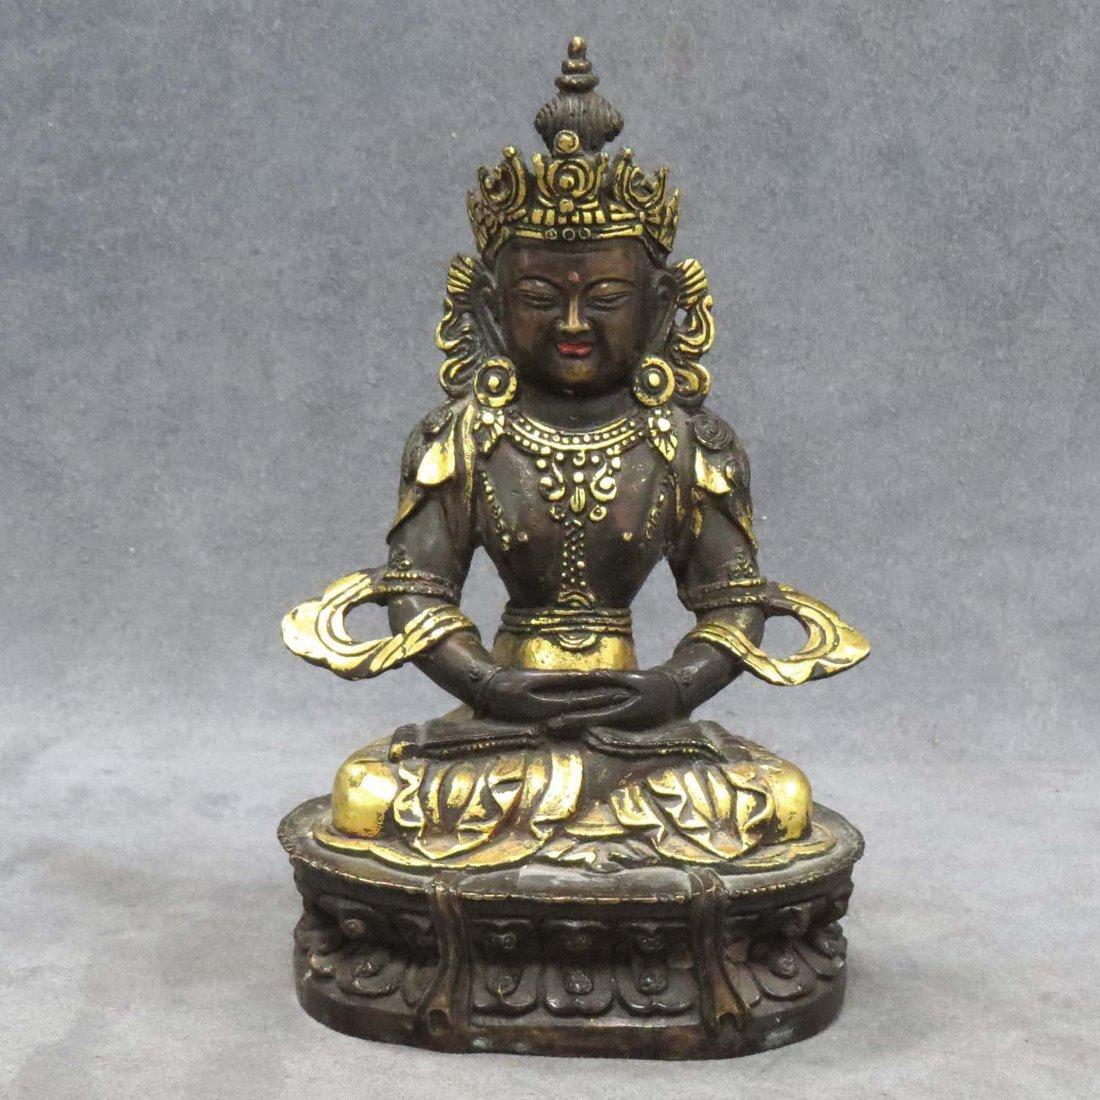 SINO-TIBETAN PARCLE-GILT BRONZE BUDDHA